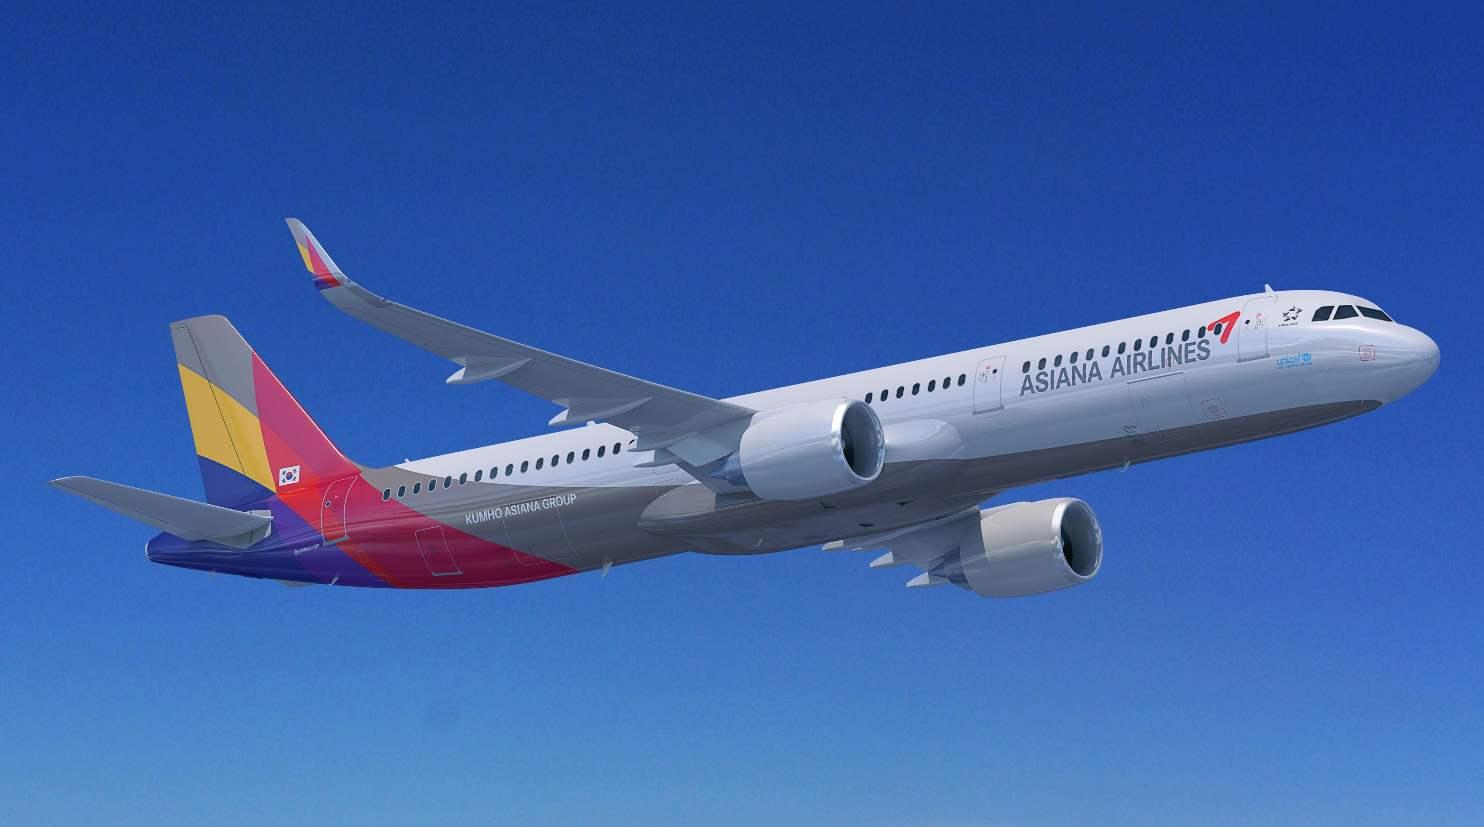 Asiana Airlines entrusts its future A321neo fleet to Lufthansa Technik